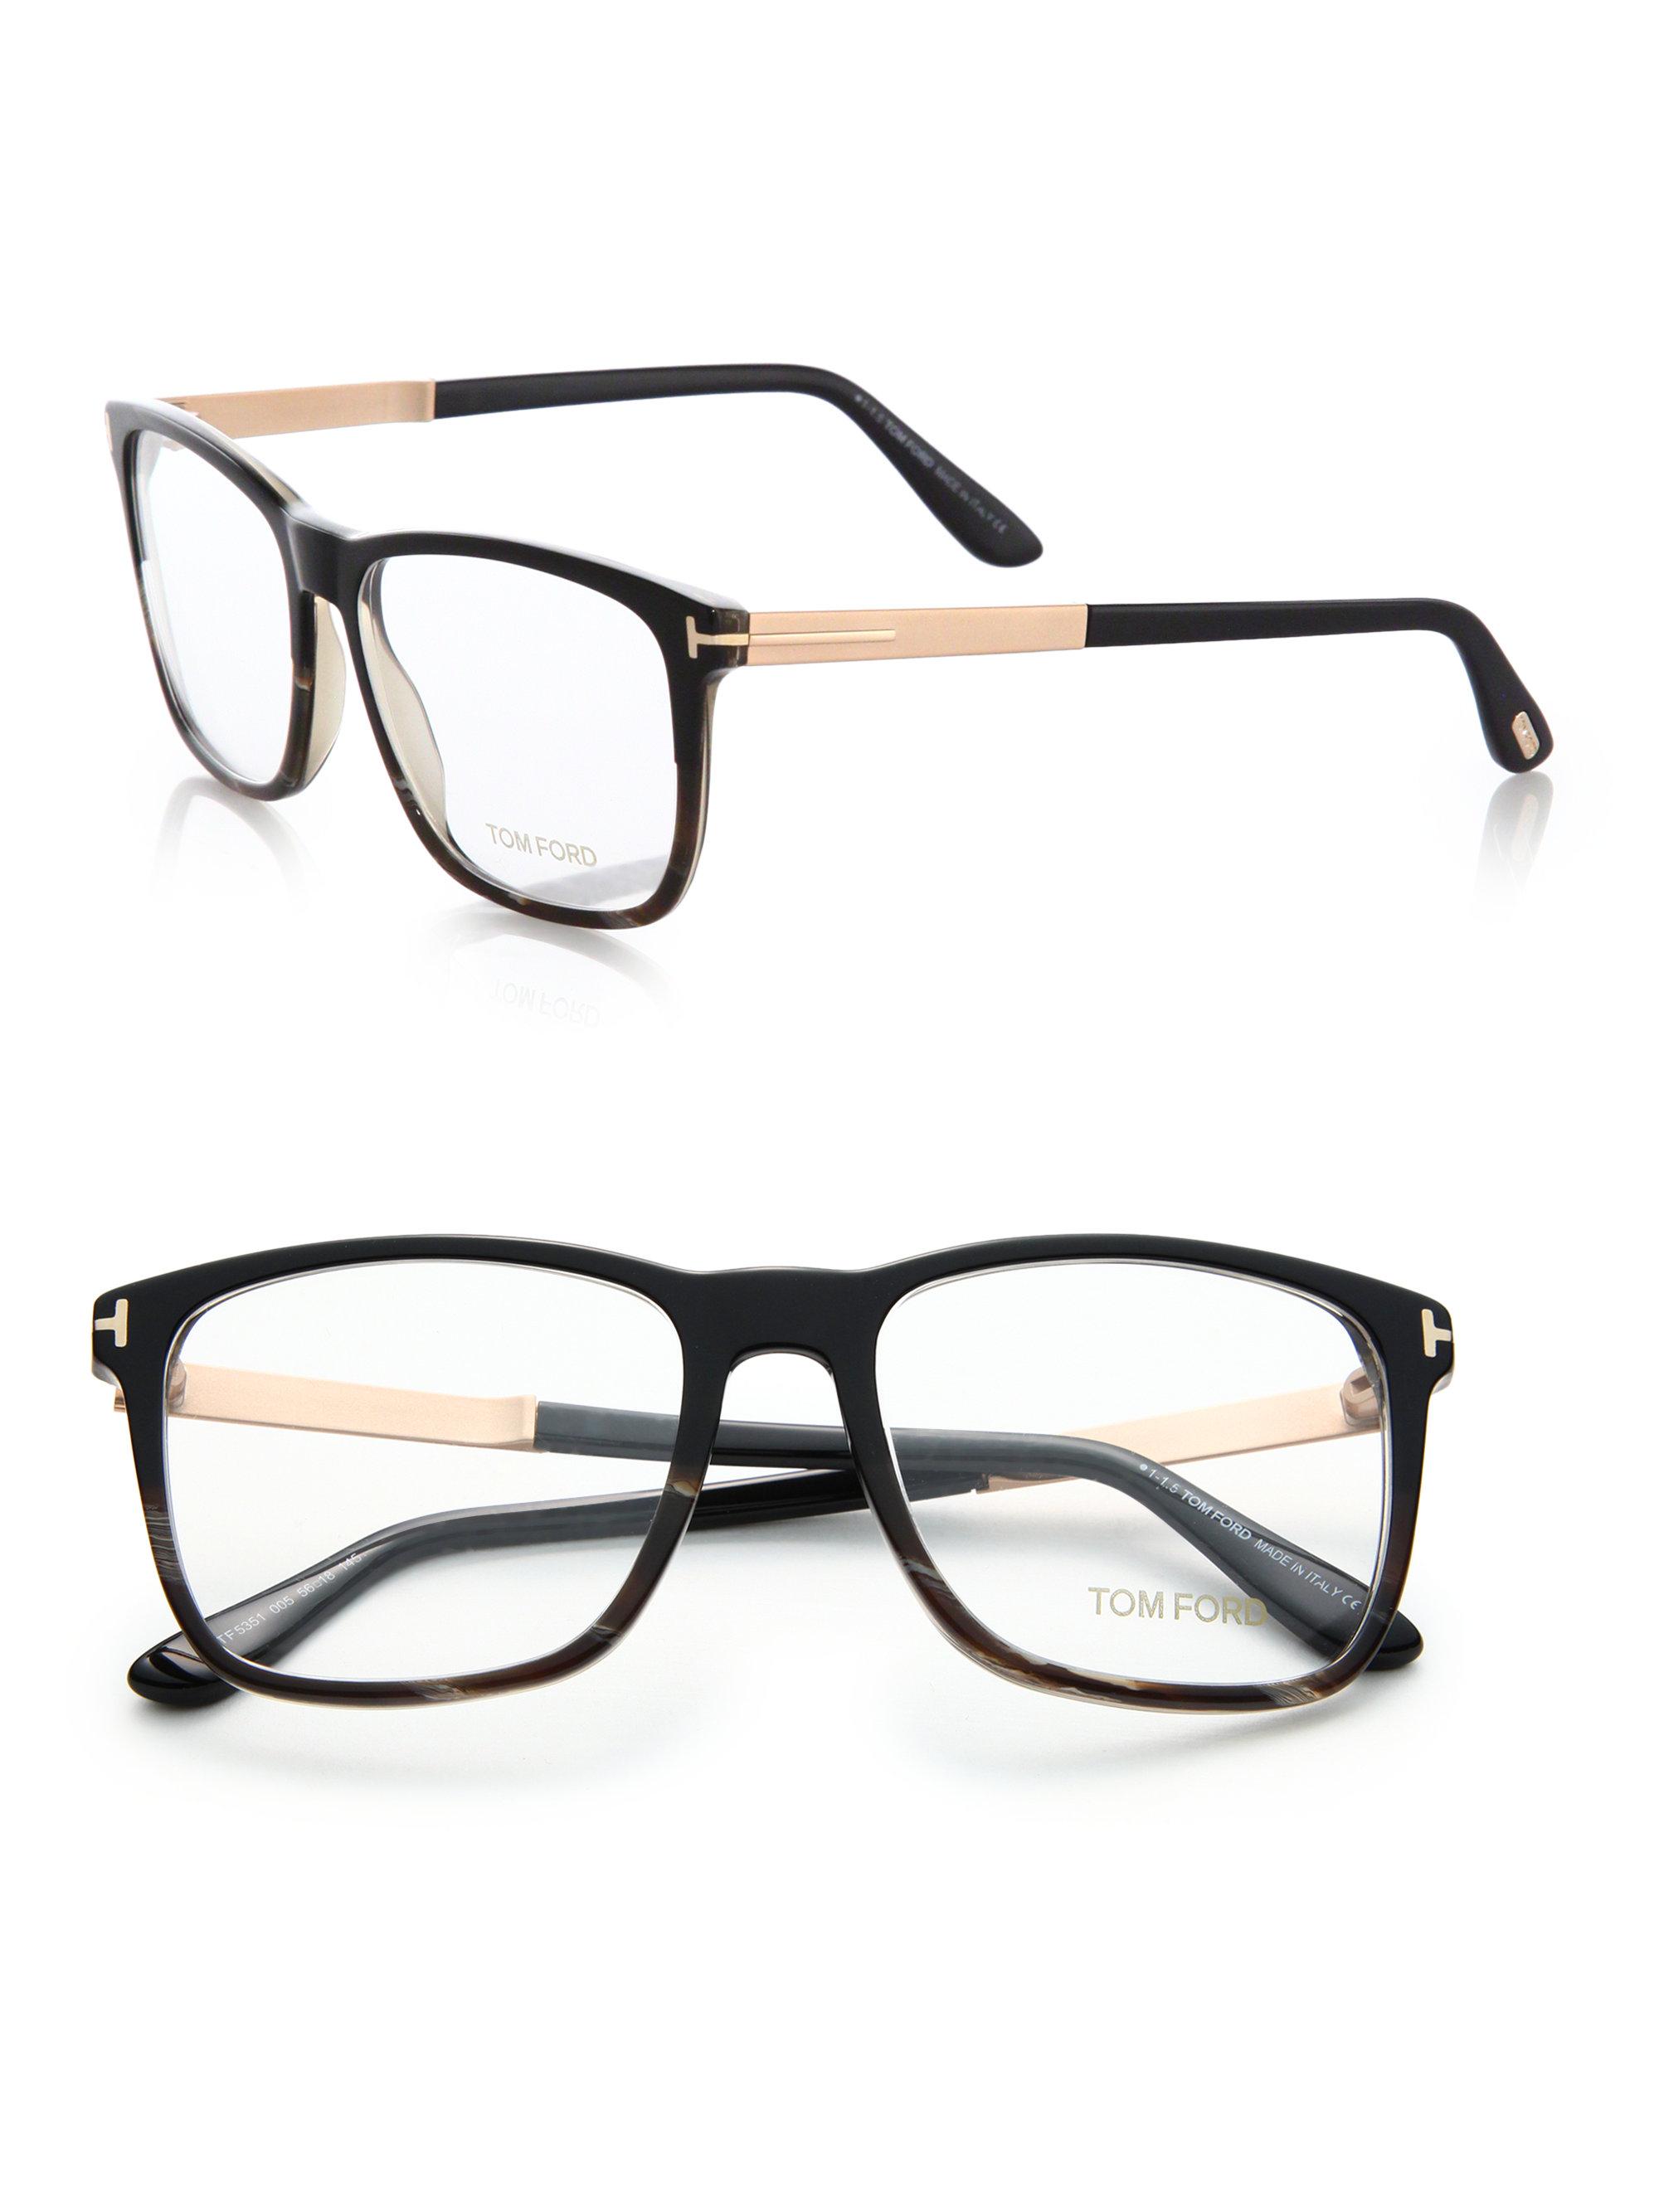 c114582a2f45c Tom Ford Square Optical Frames in Black - Lyst